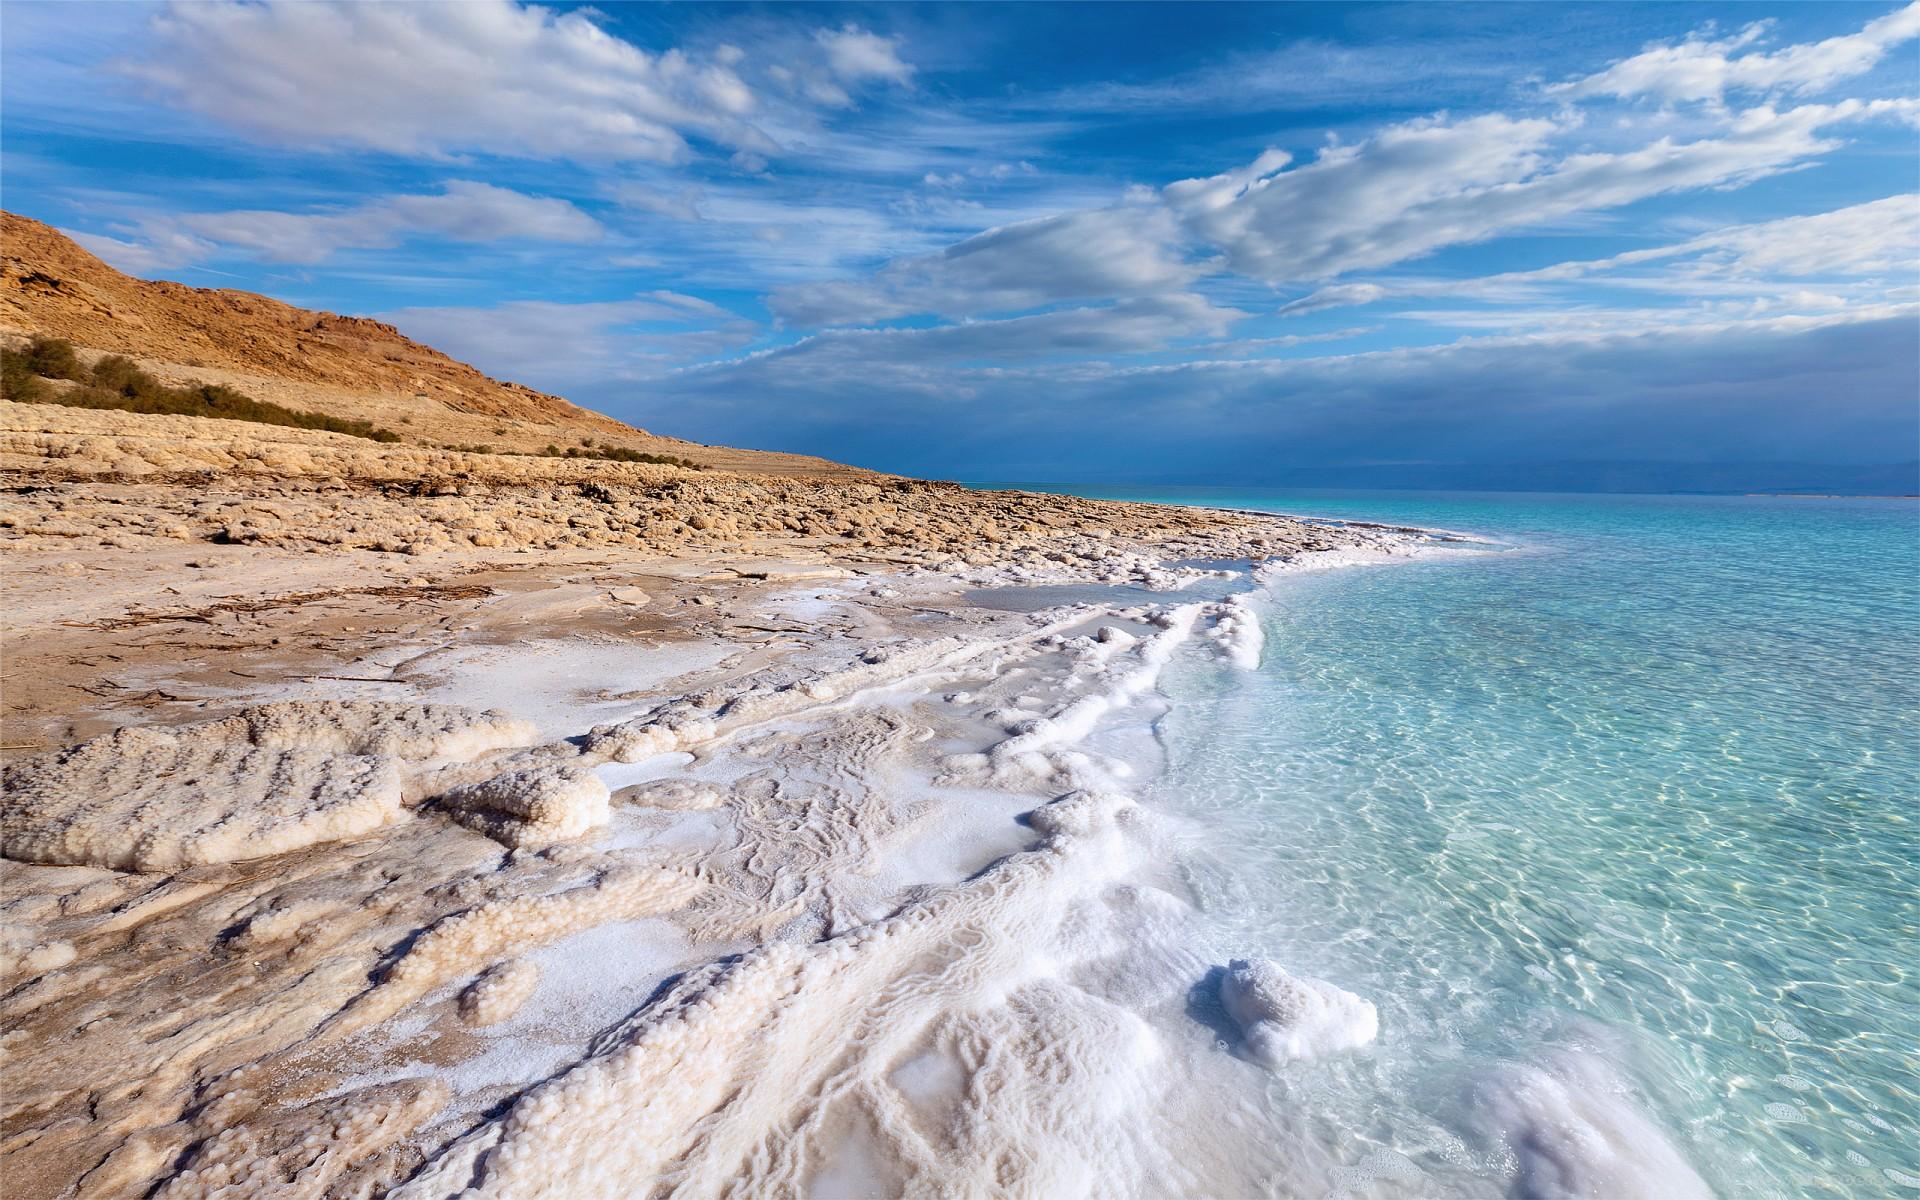 тури в їзраїль, паломницький тур в ізраїль